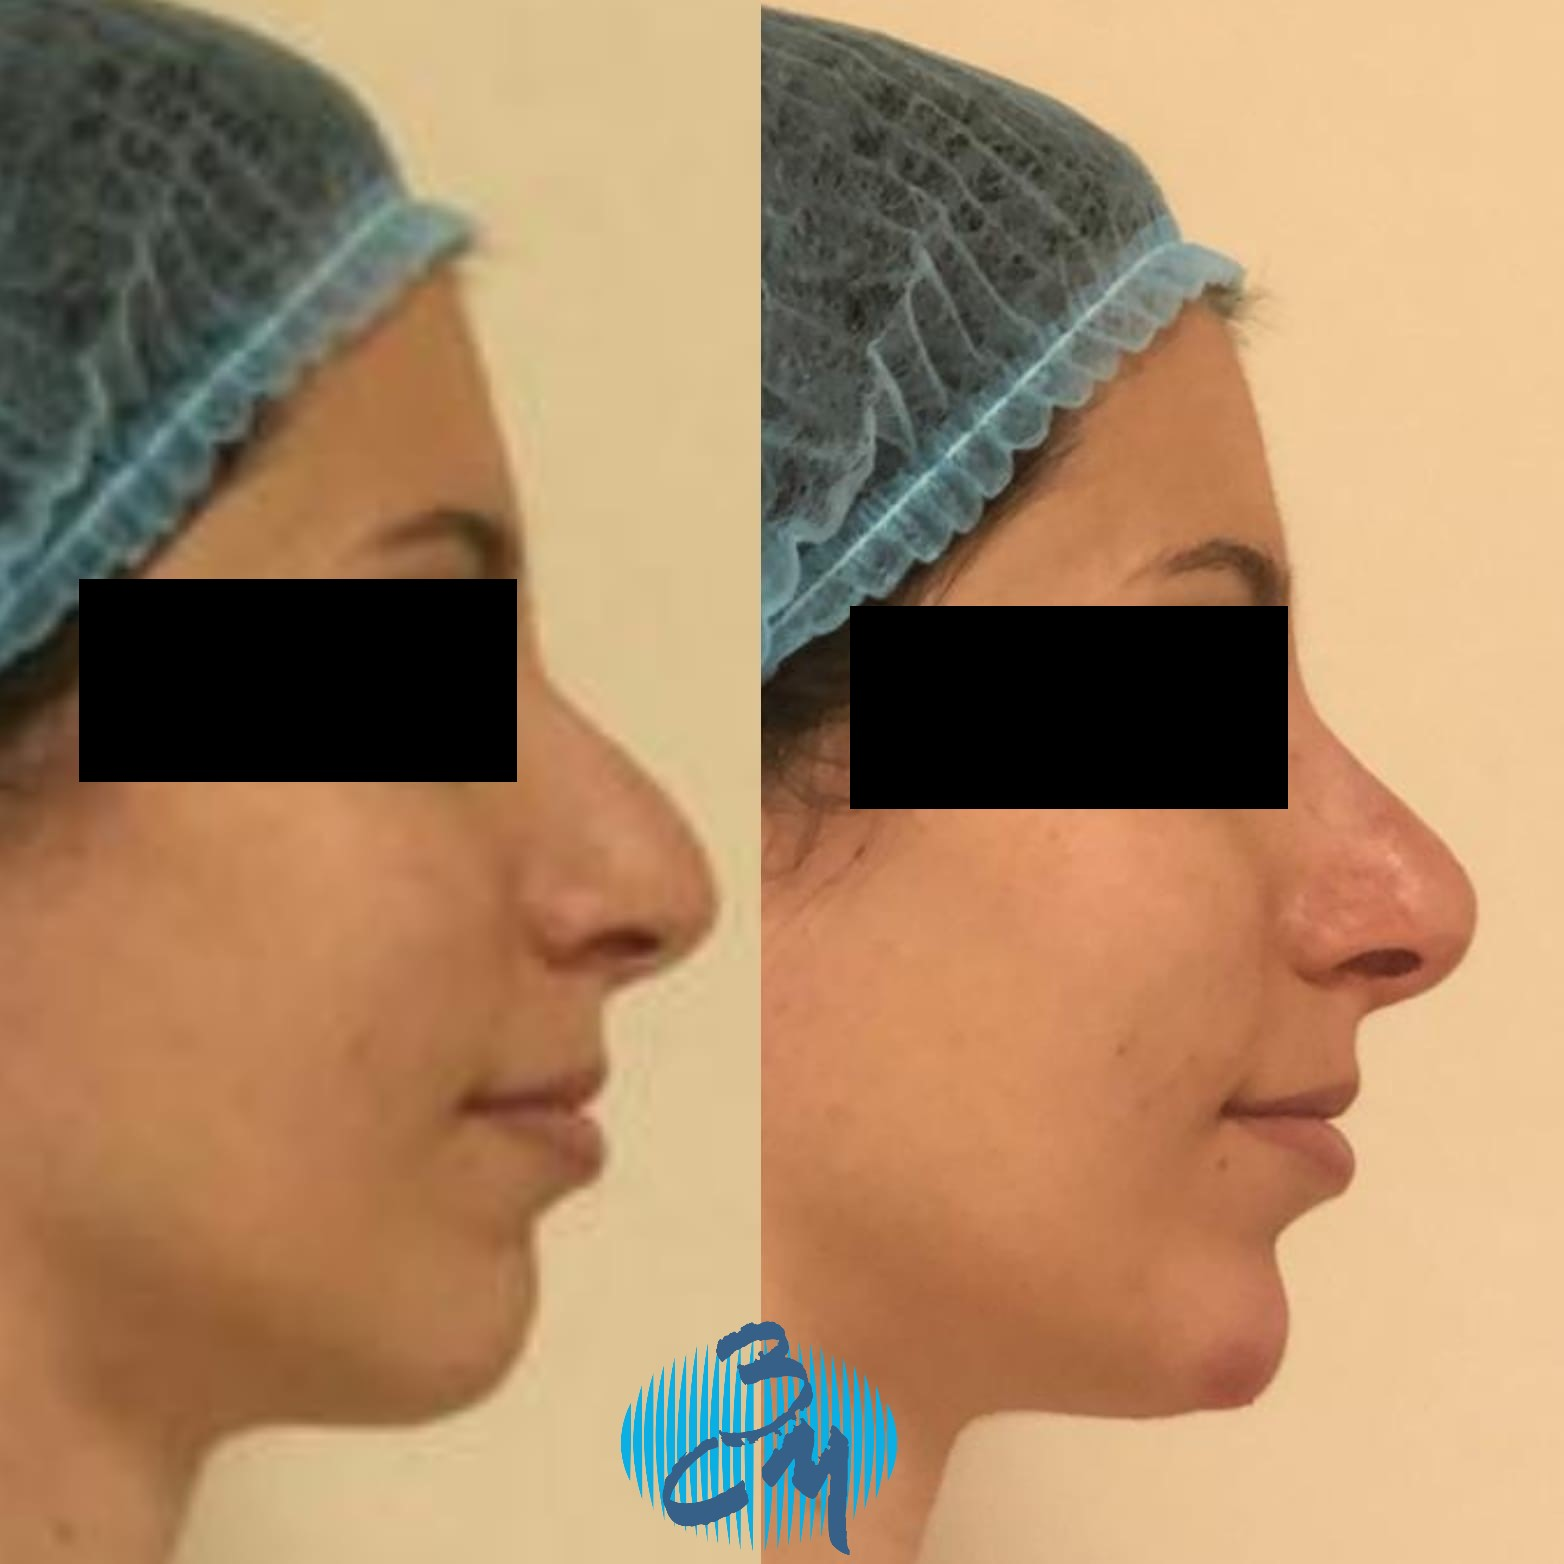 Rinomodelación sin cirugia con Ácido Hialuronico RHA4